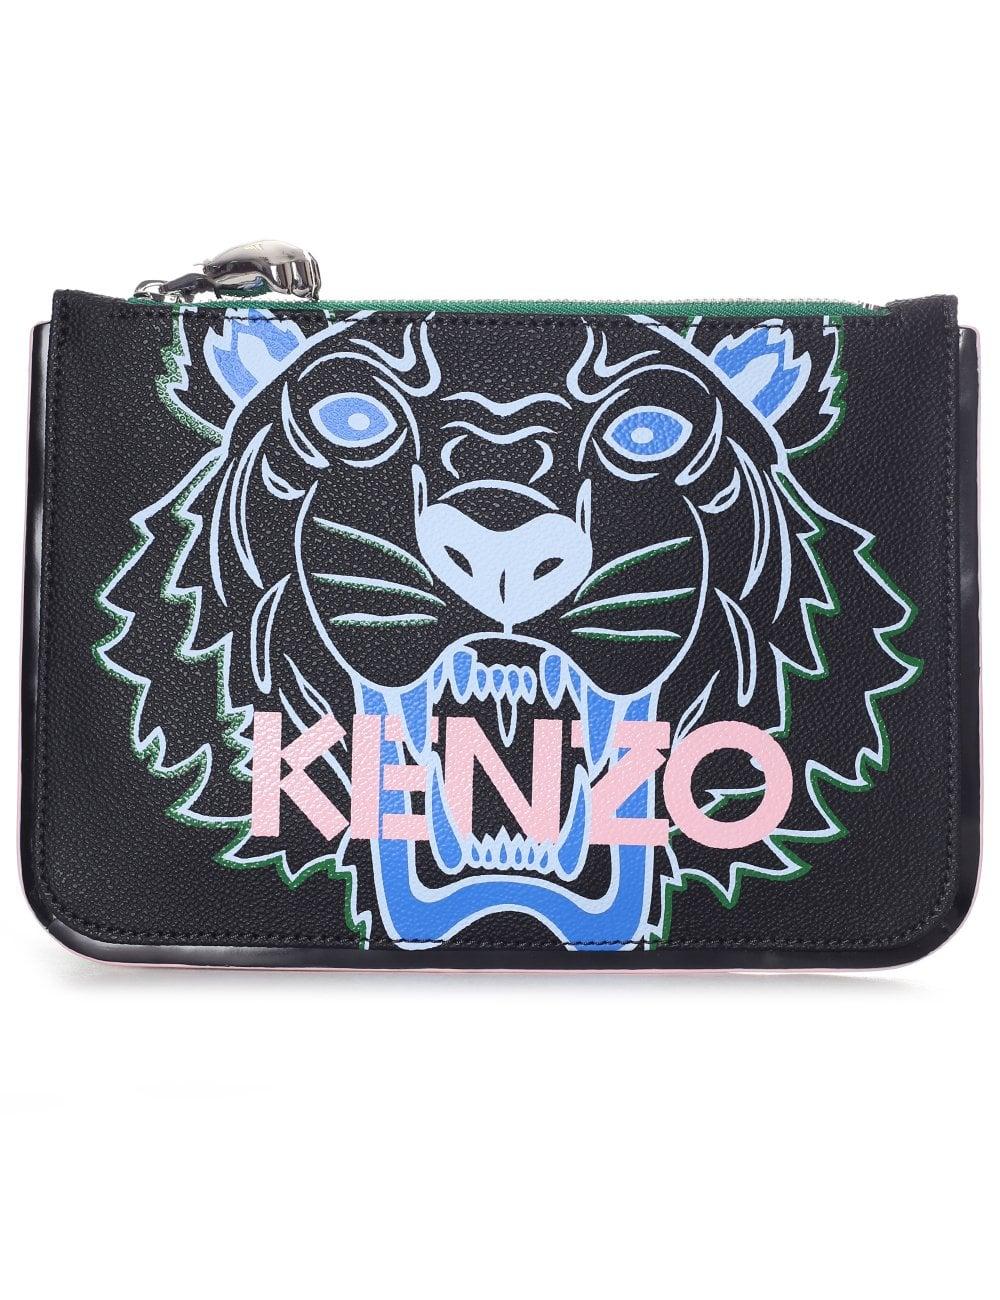 55ef7b5e Kenzo Women's A5 Tiger Clutch